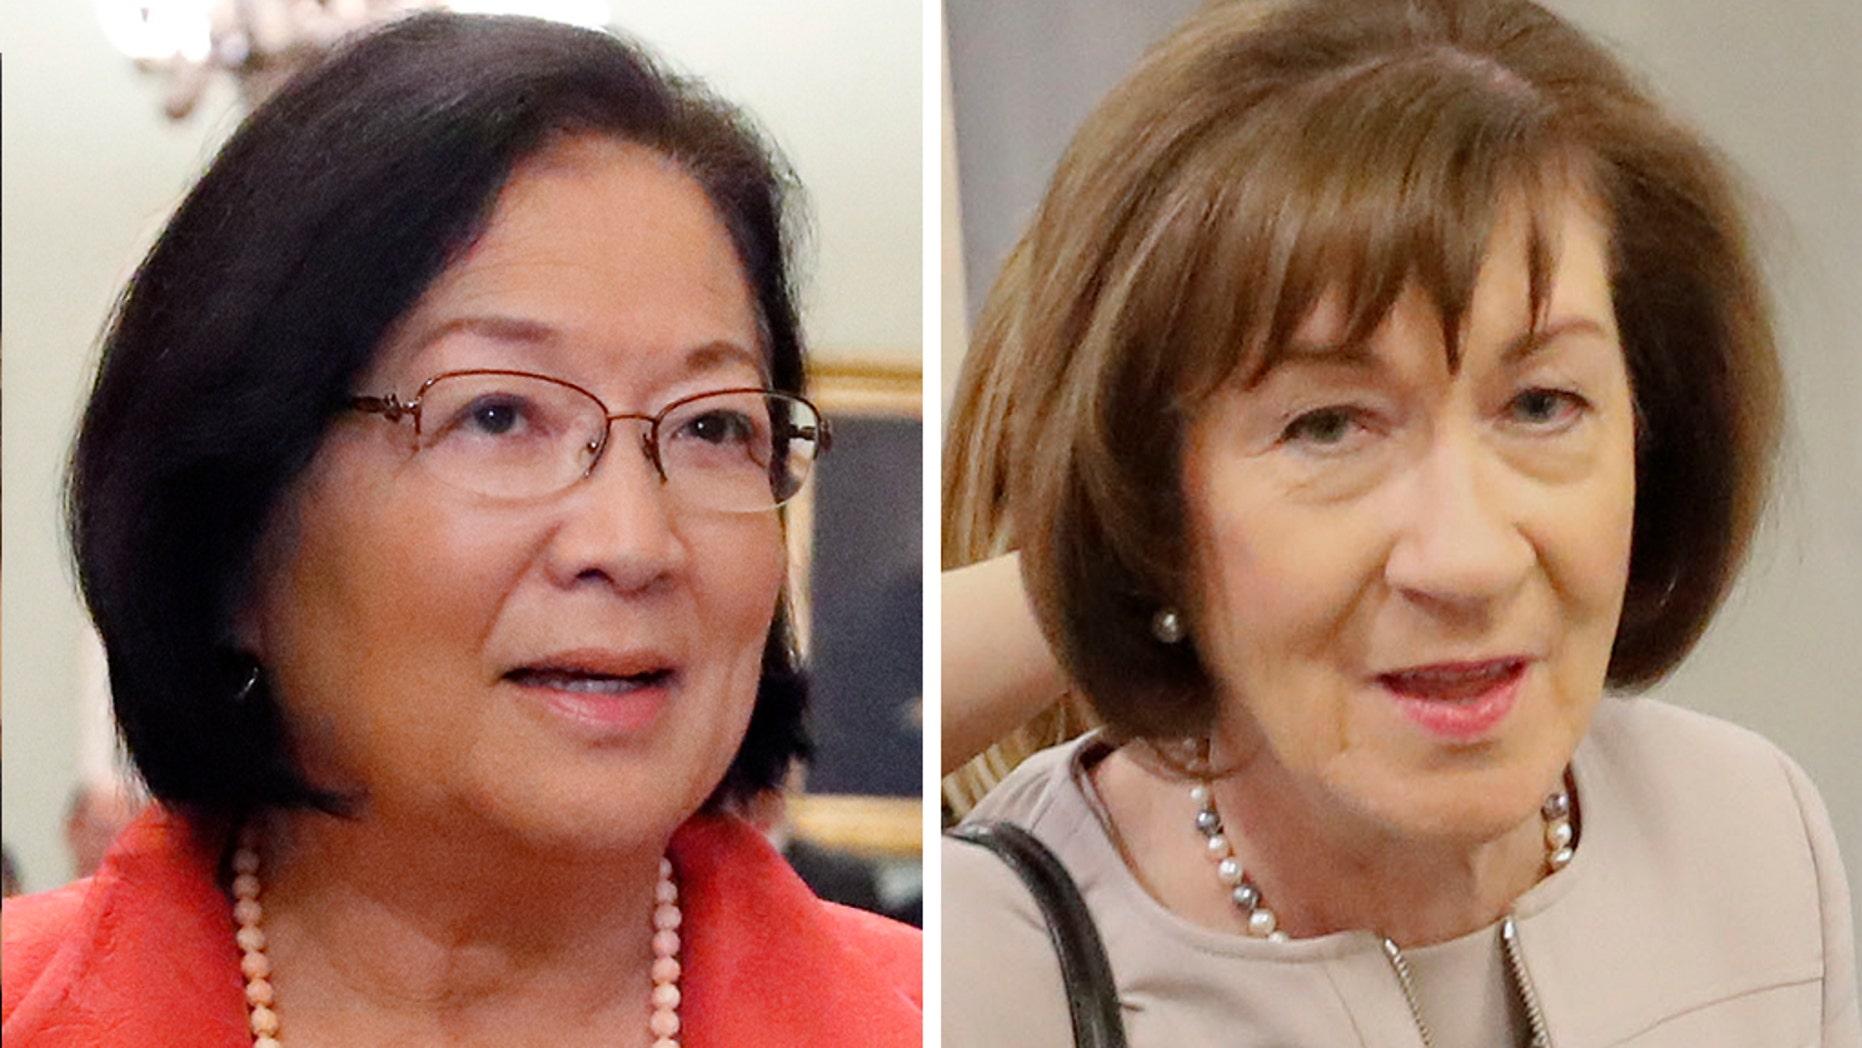 Sen. Mazie Hirono, left, said Sen. Susan Collins' reasoning for supporting Brett Kavanaugh's Supreme Court nomination was 'insulting.'